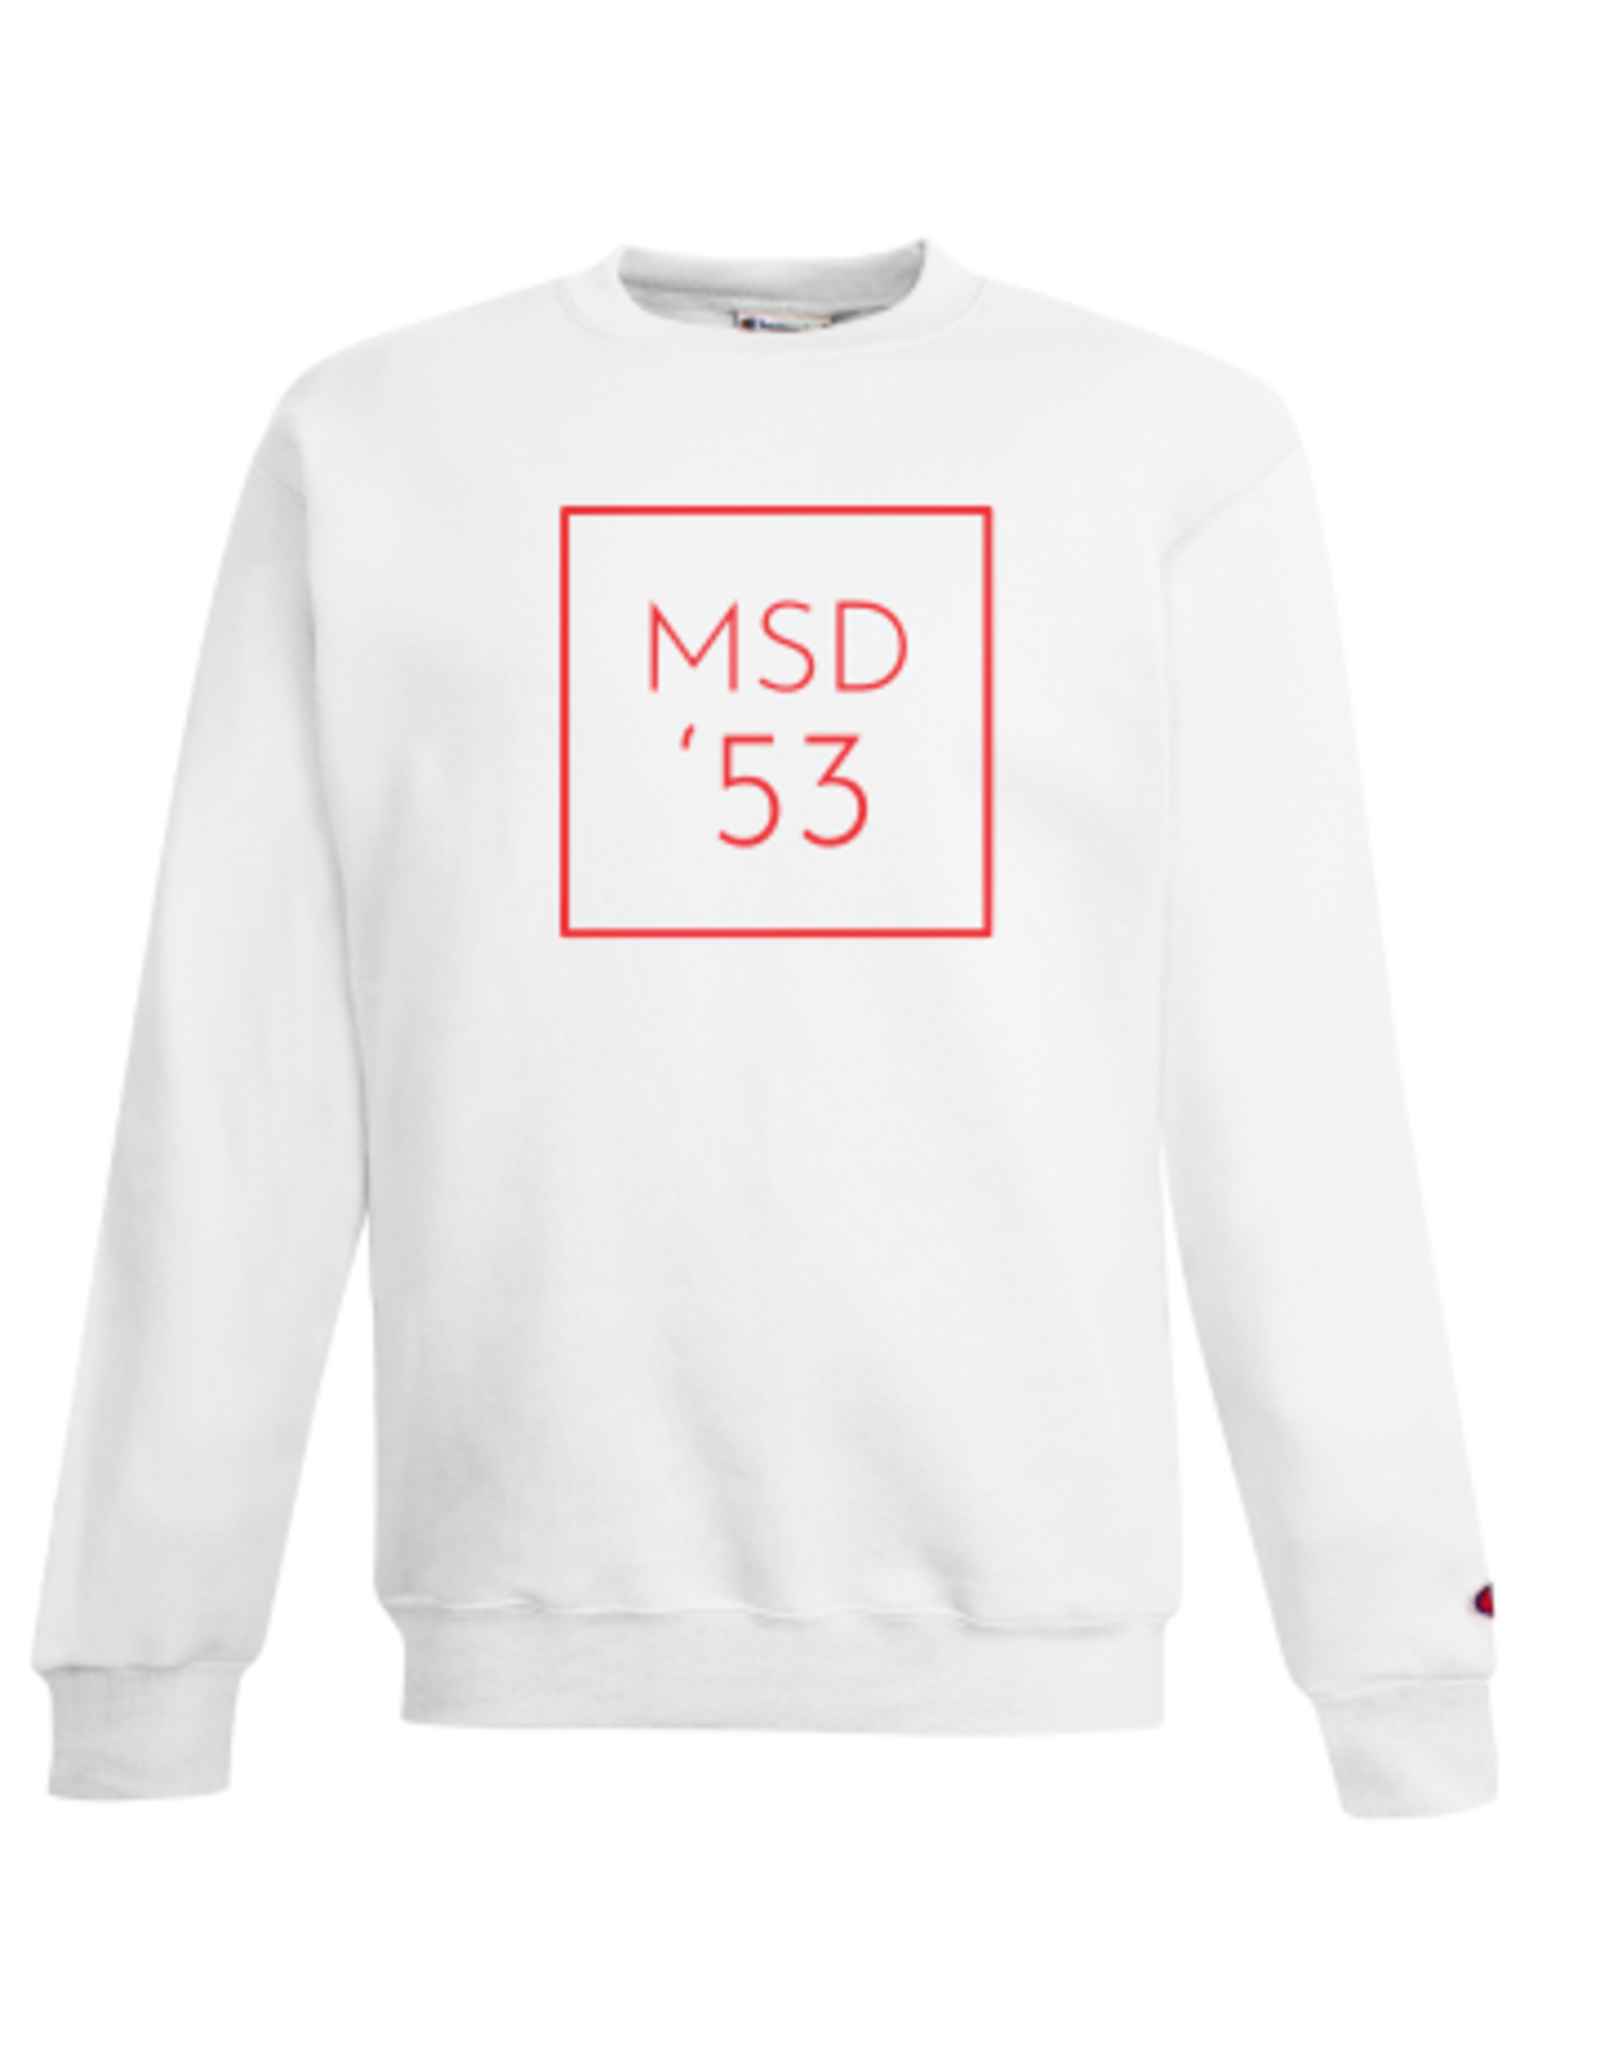 Champion Martin 53 Crew neck sweater - Adult